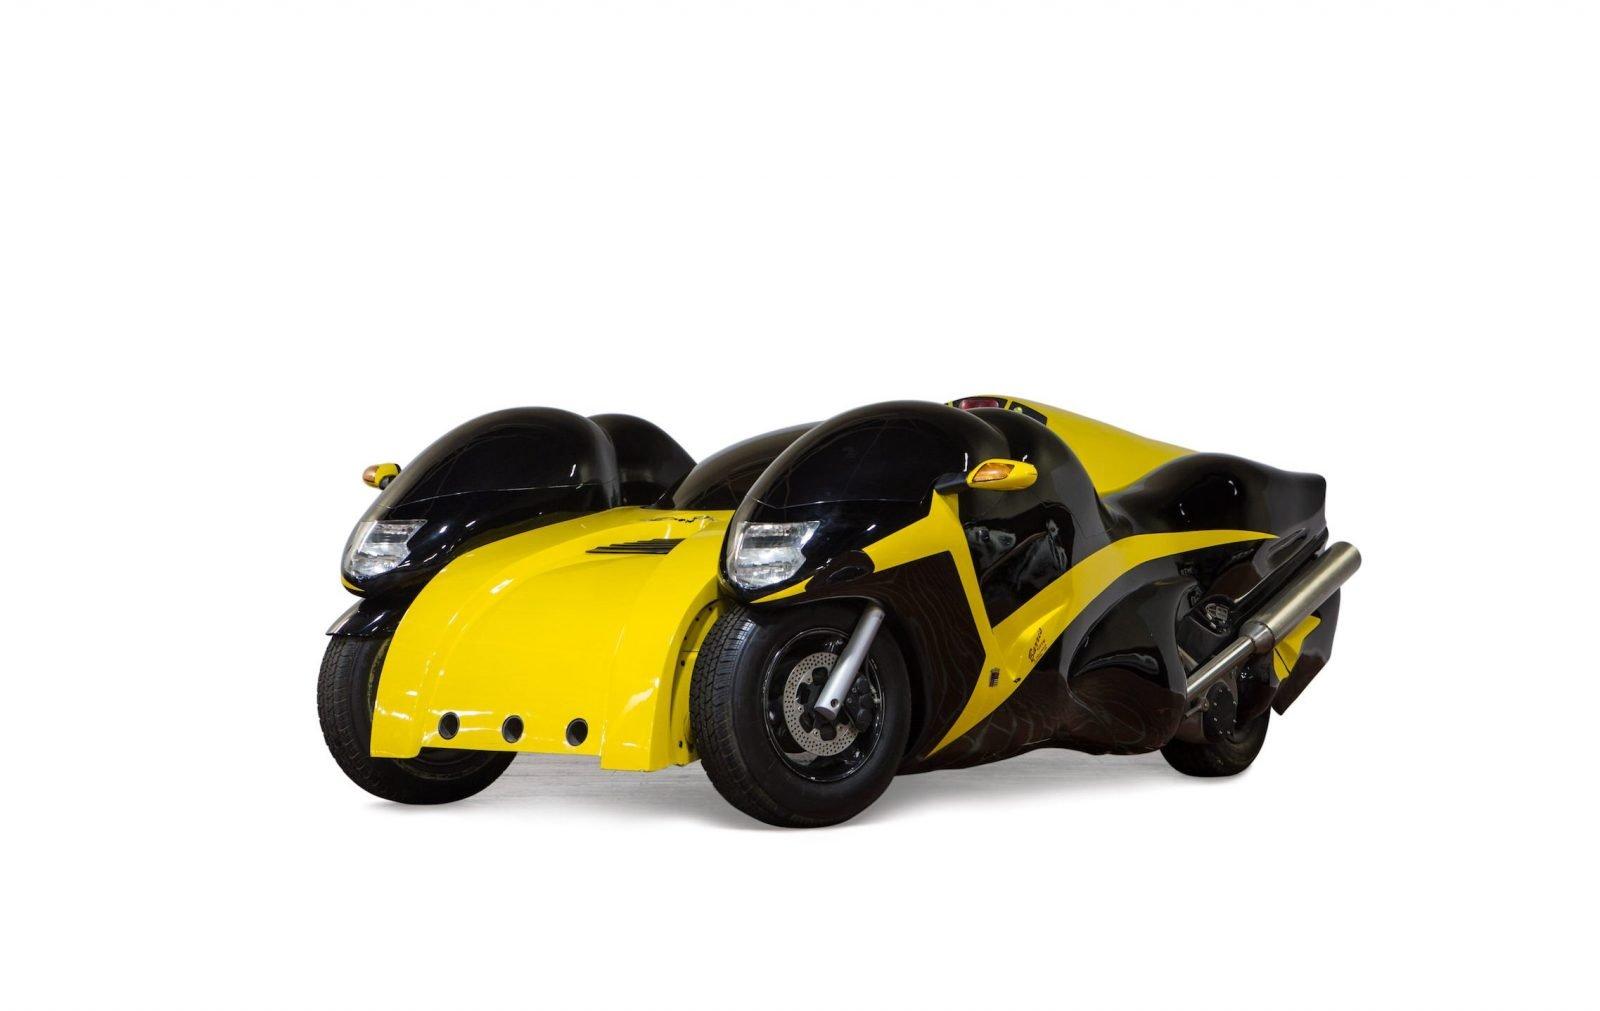 Team Knight Rider High Speed Pursuit Vehicle e1493200417466 1600x1011 - The Team Knight Rider High Speed Pursuit Vehicle